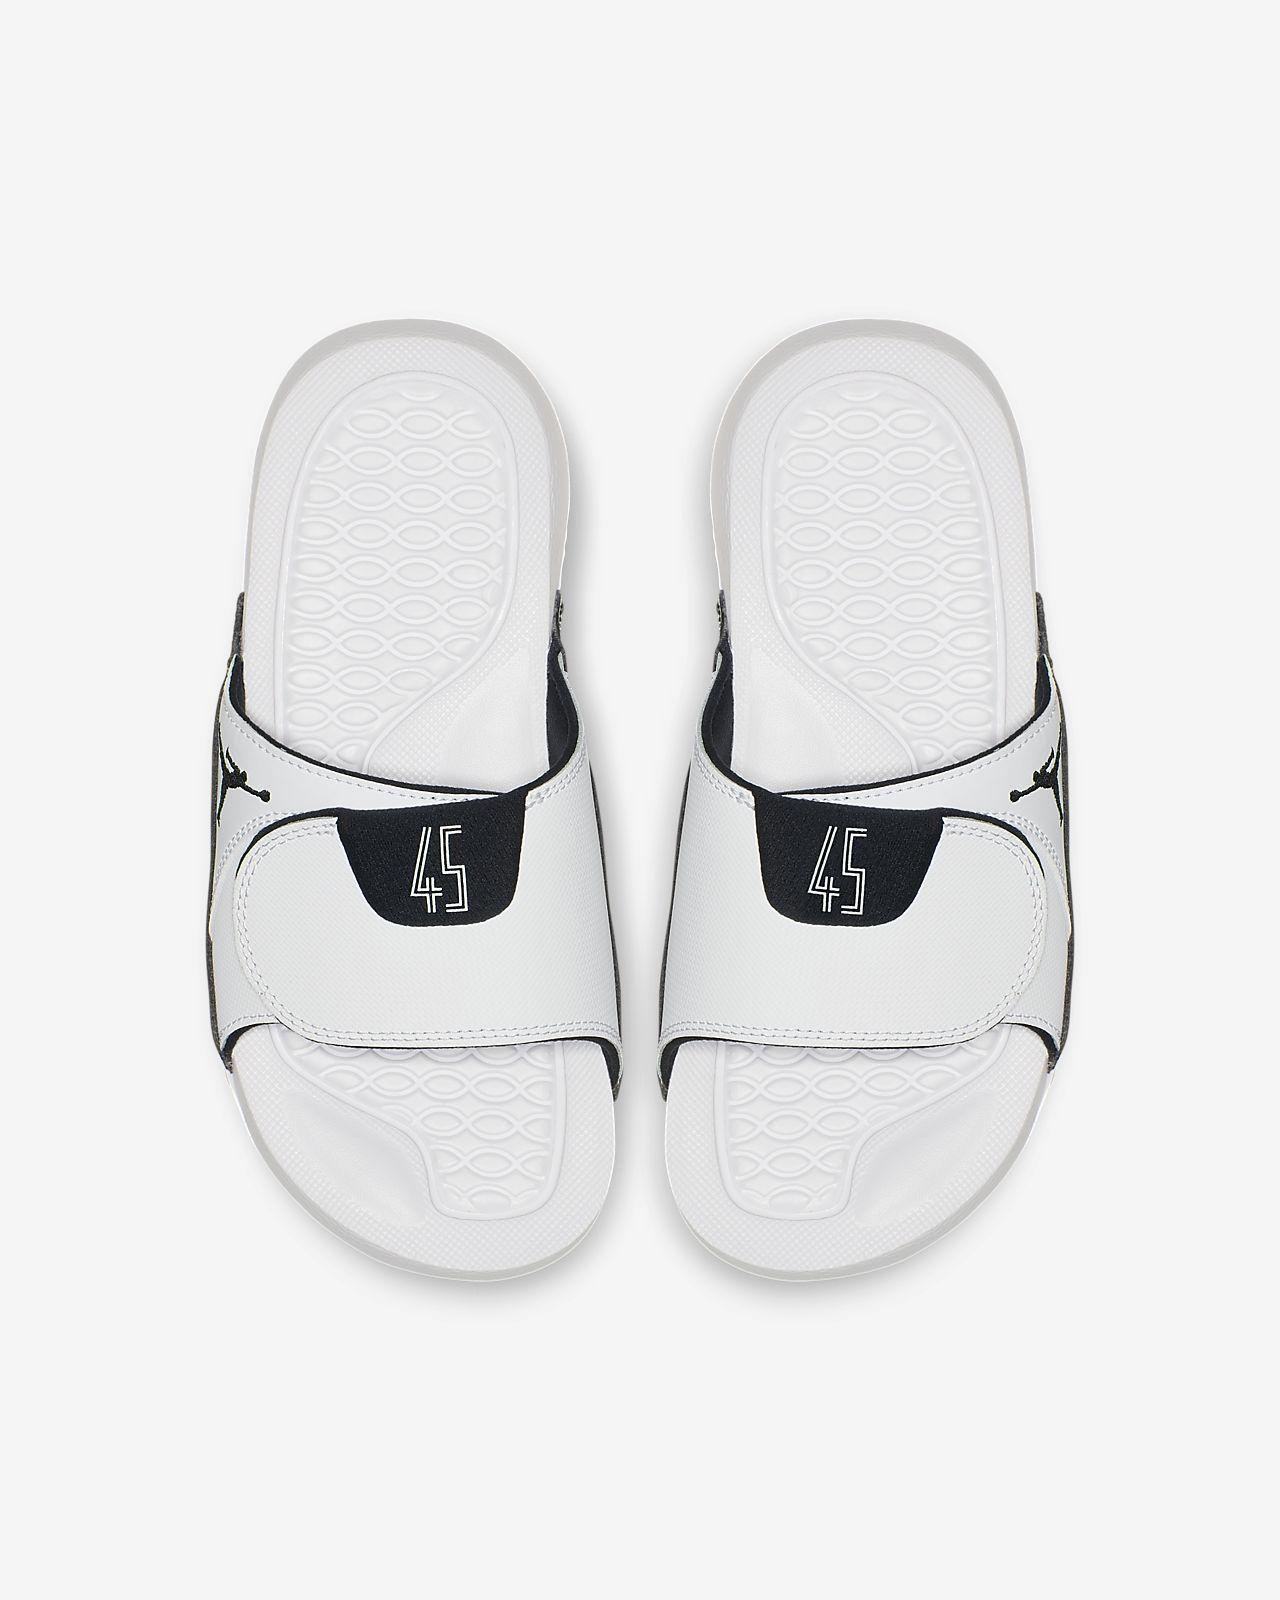 88267a250b5e9 Jordan Hydro XI Retro Big Kids  Slide. Nike.com